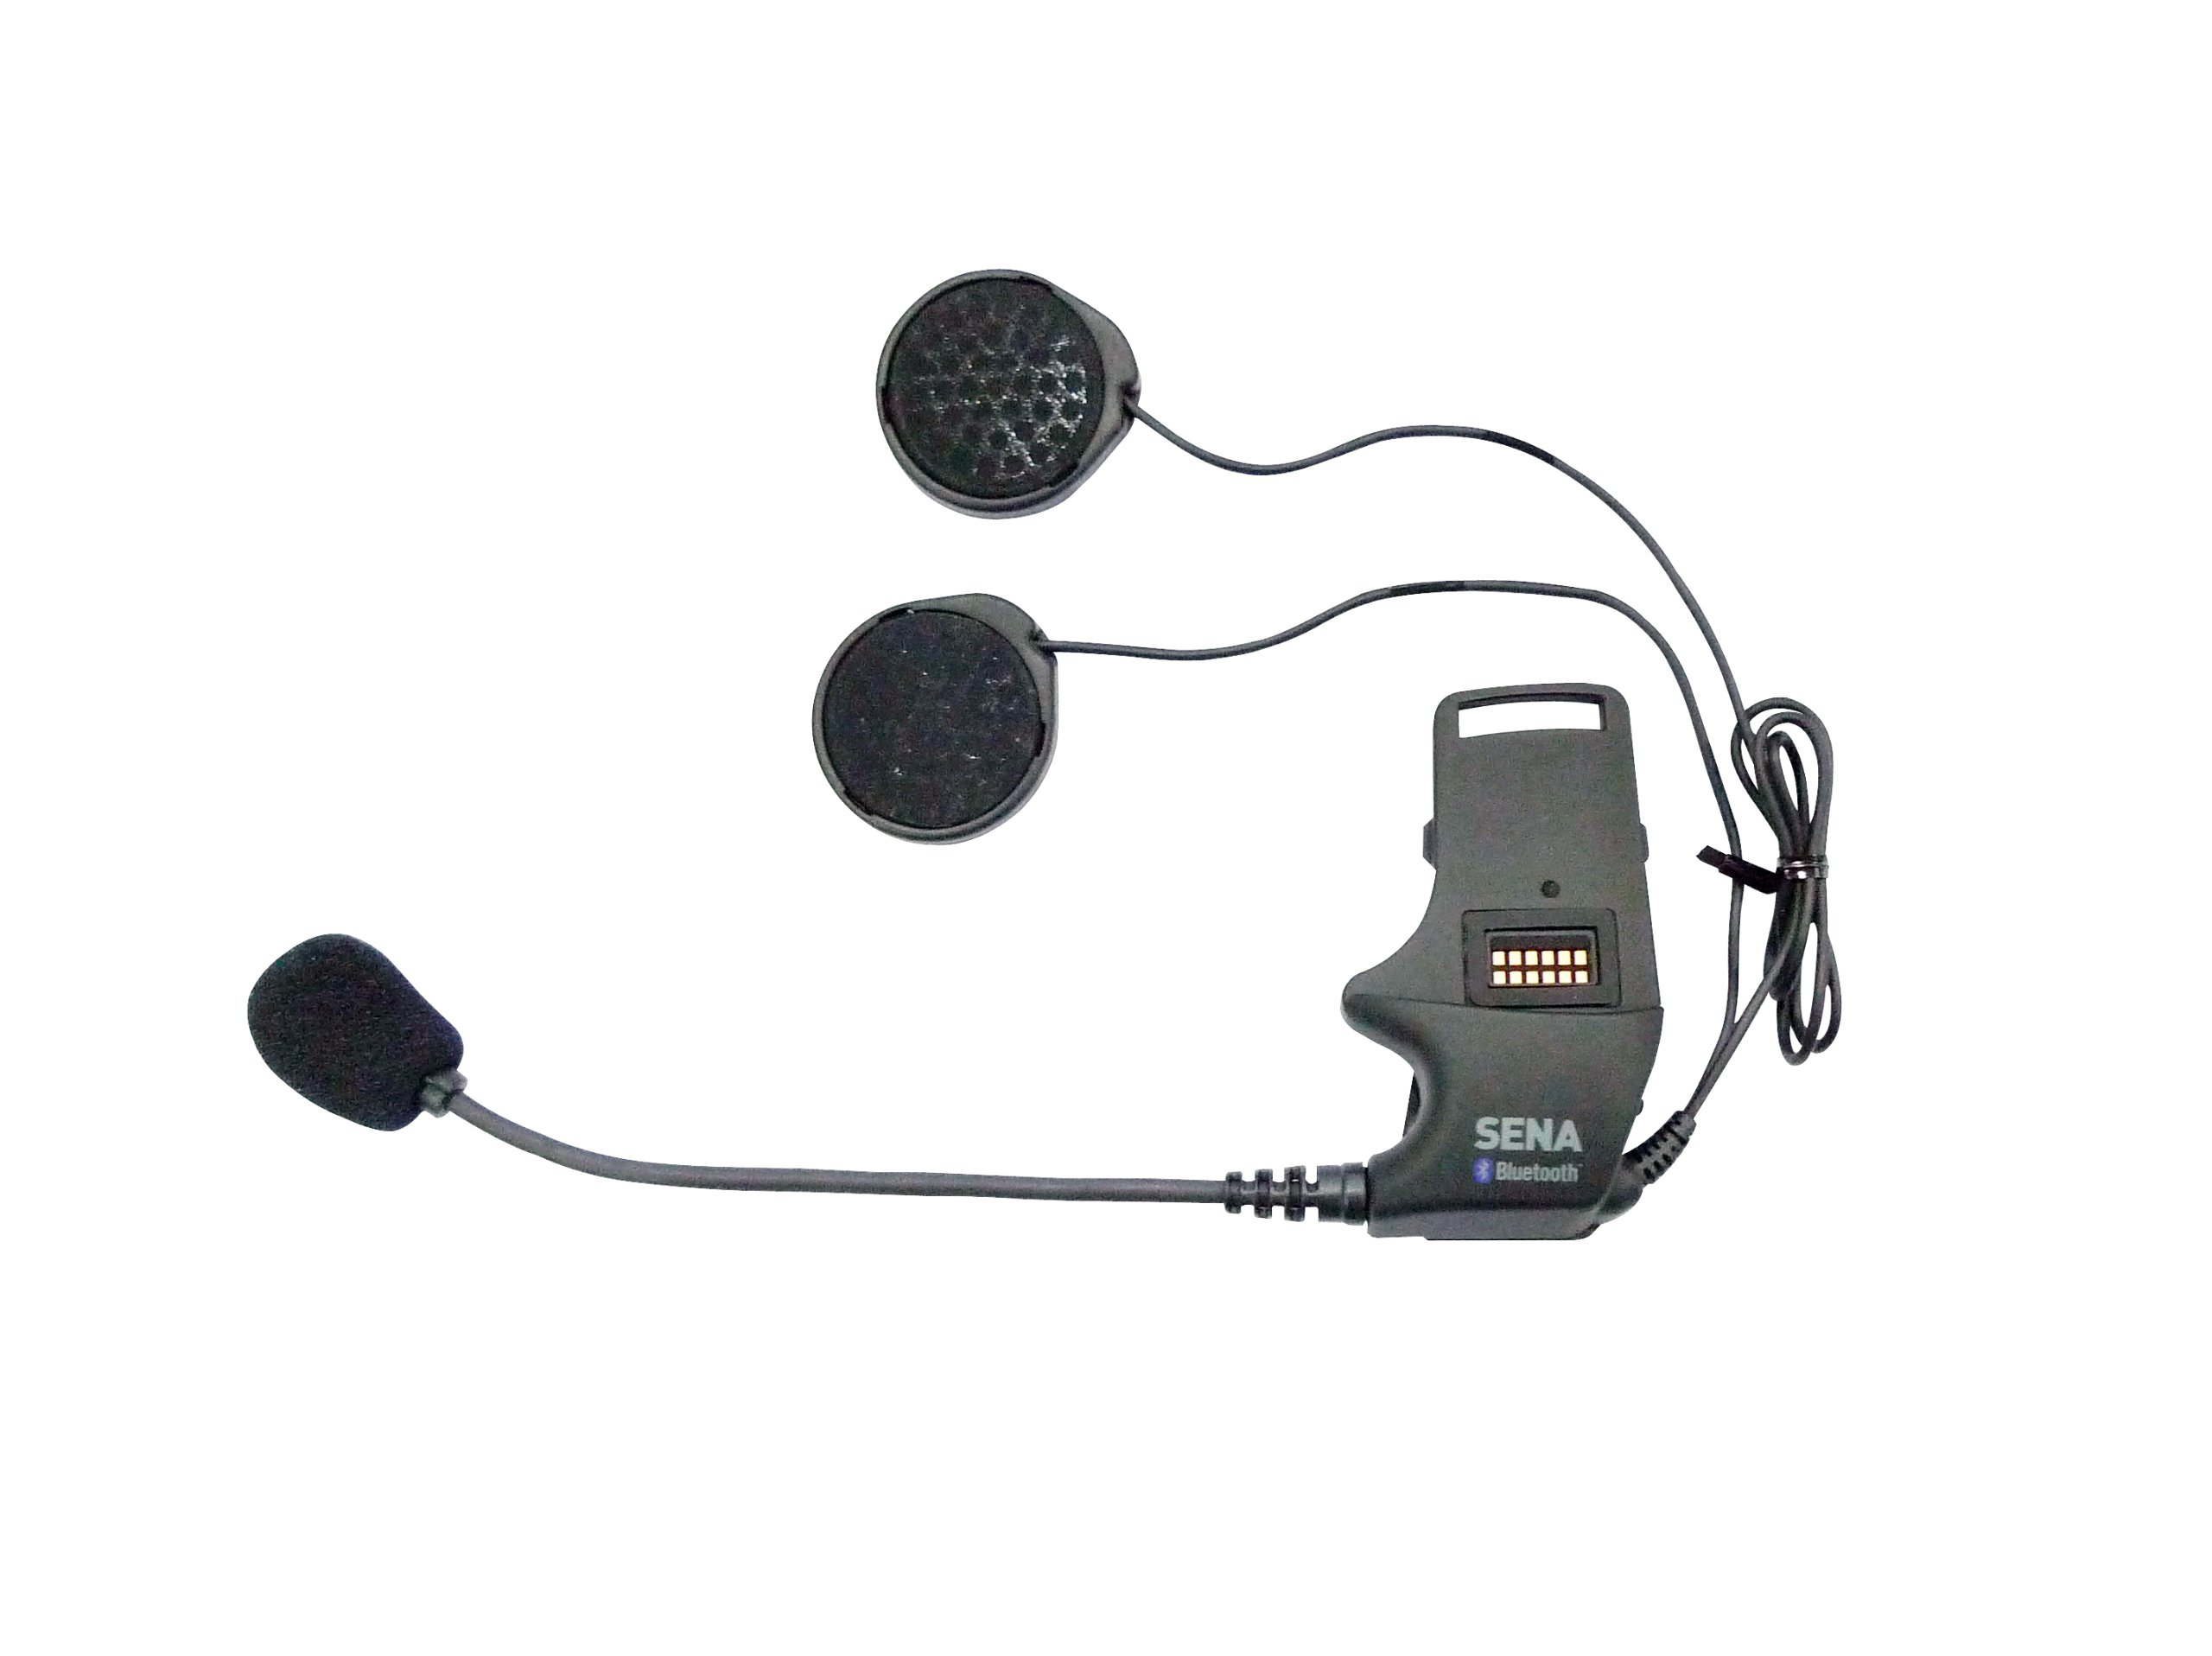 Sena SMH-A0301 Helmet Clamp Kit with Boom Microphone for SMH10 Bluetooth Headset